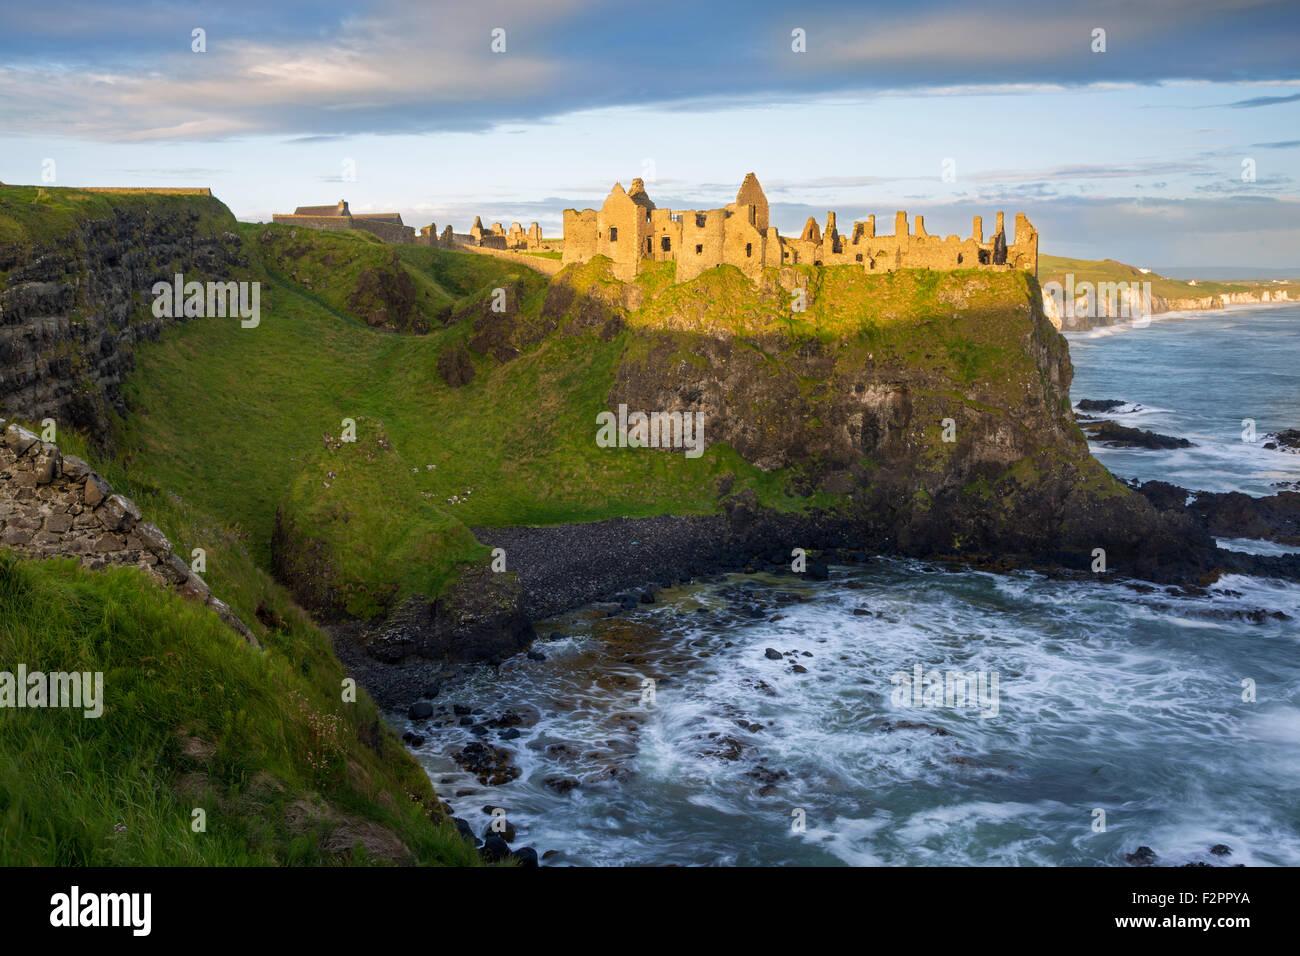 Sunrise over Dunluce Castle along northern coast of County Antrim, Northern Ireland, UK Stock Photo